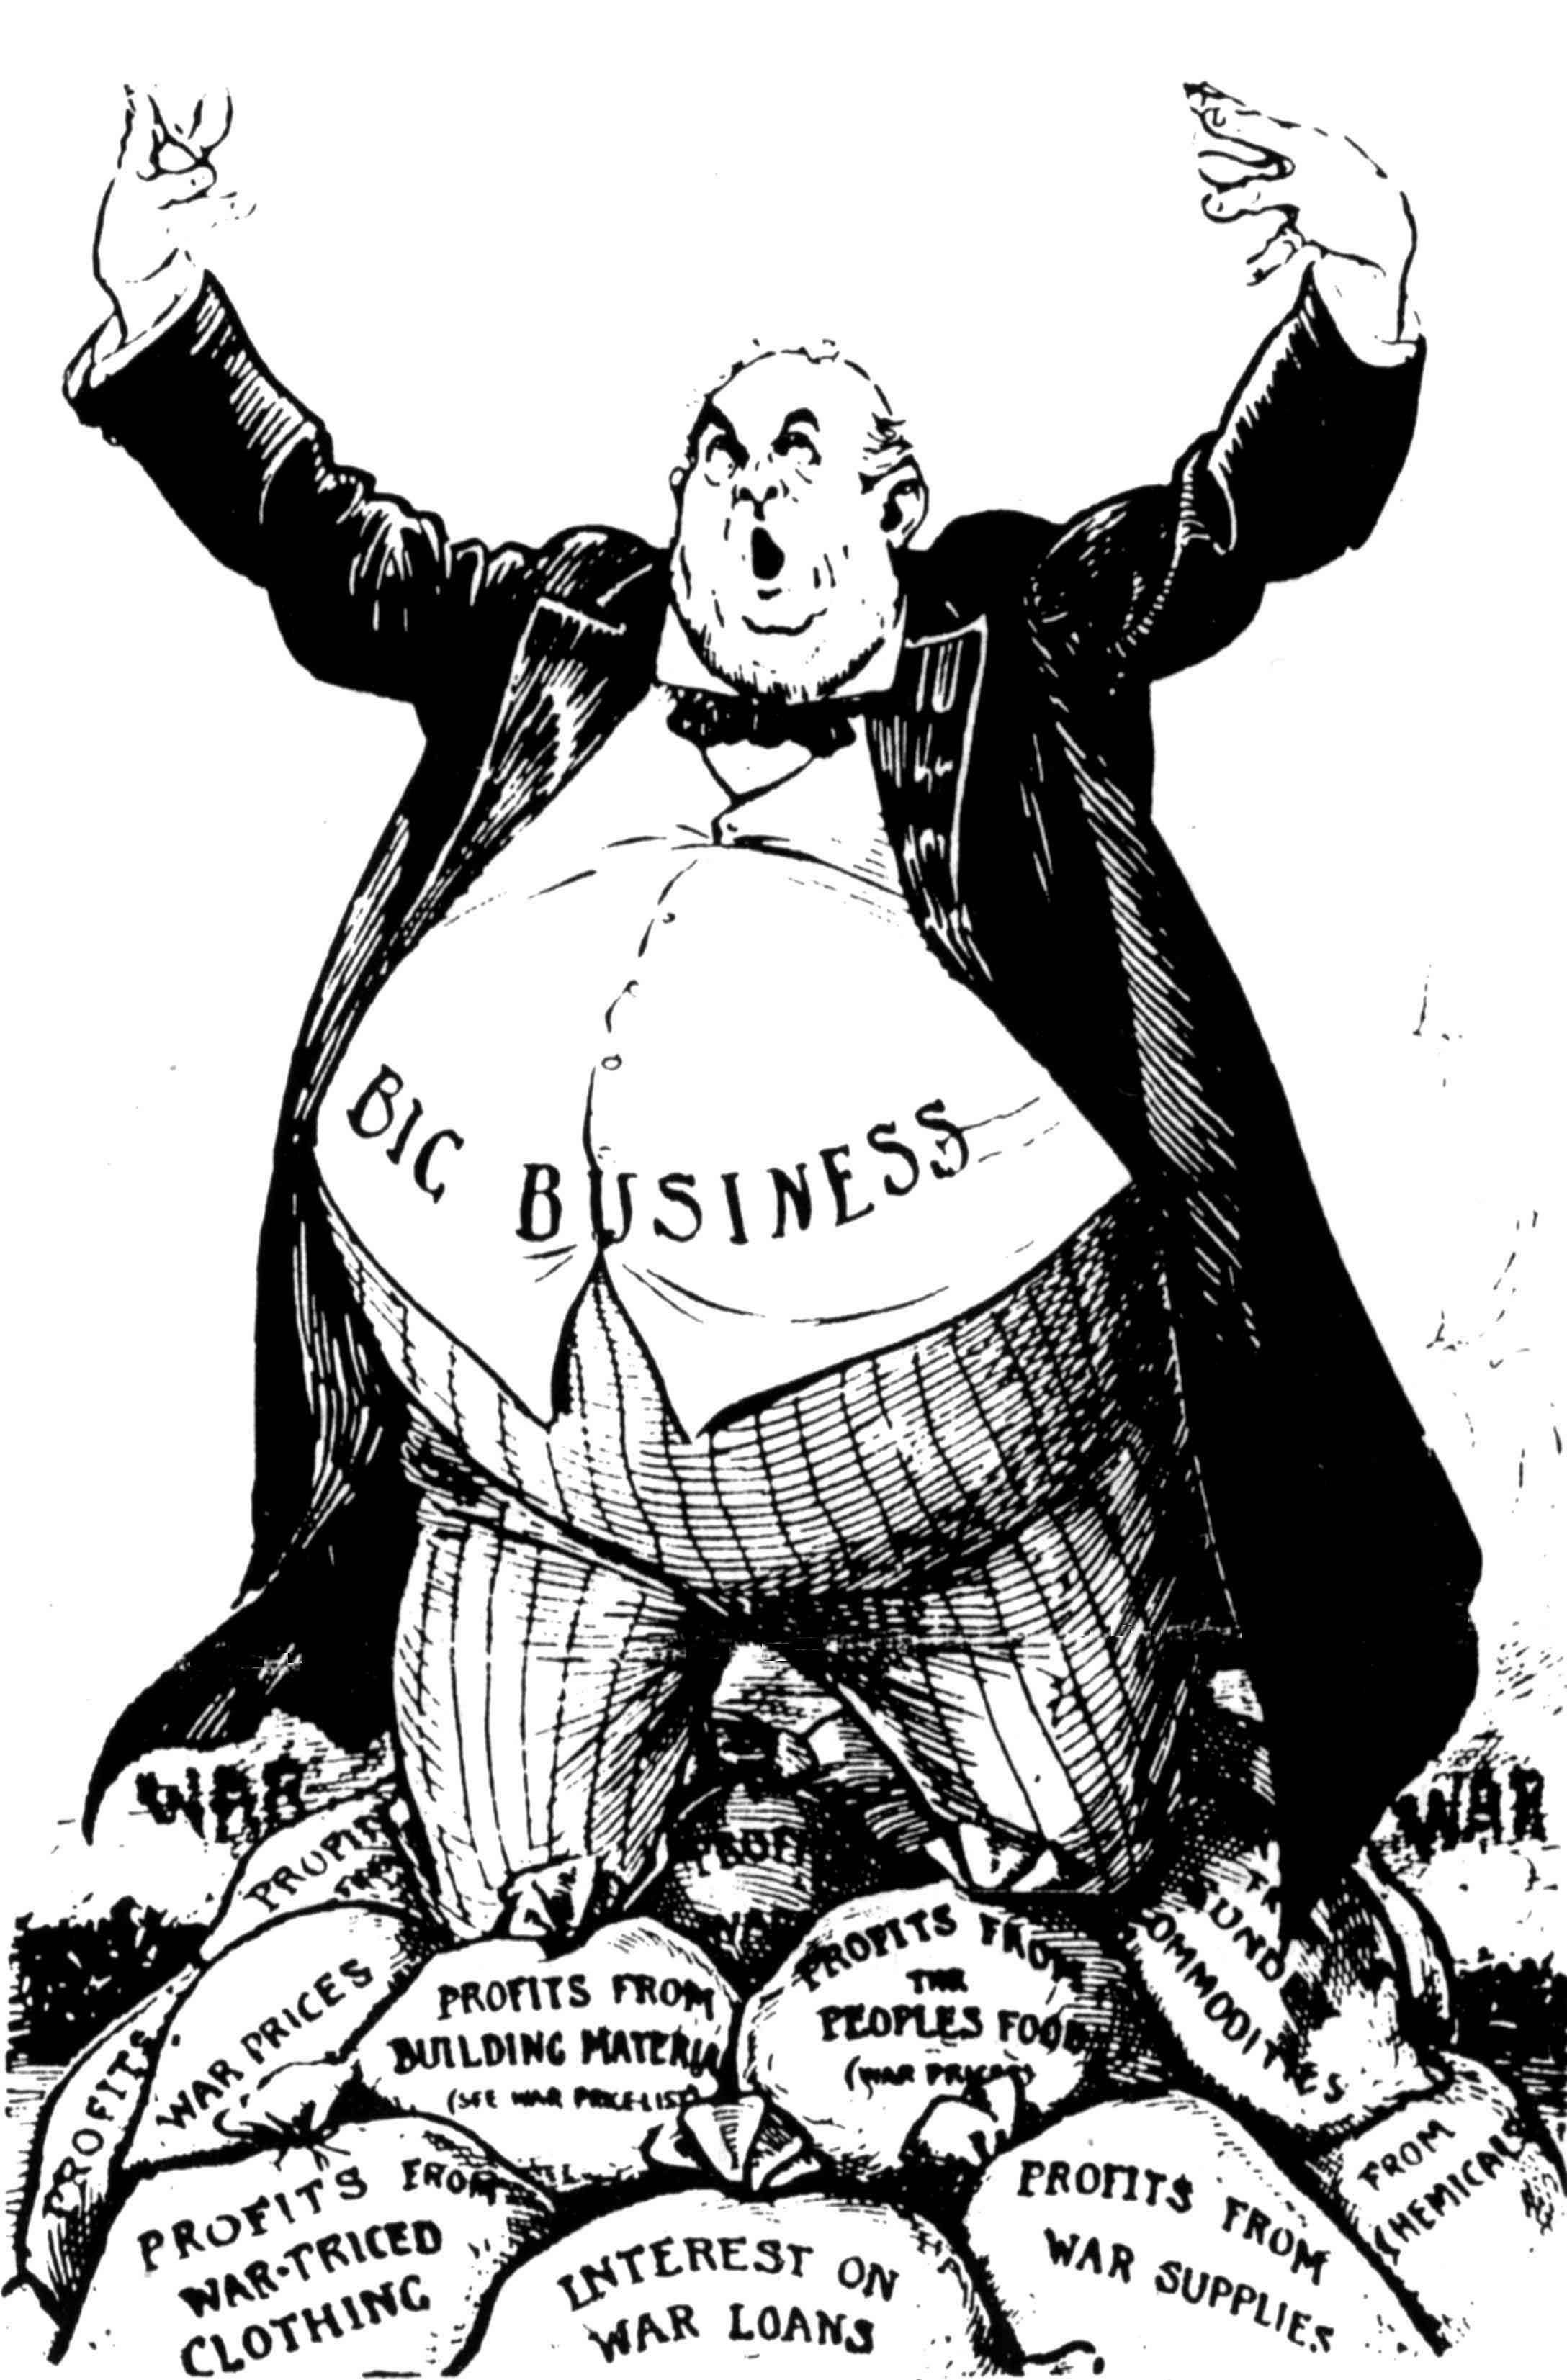 https://wellexaminedlife.files.wordpress.com/2013/11/capitalism-cartoonweb.jpg